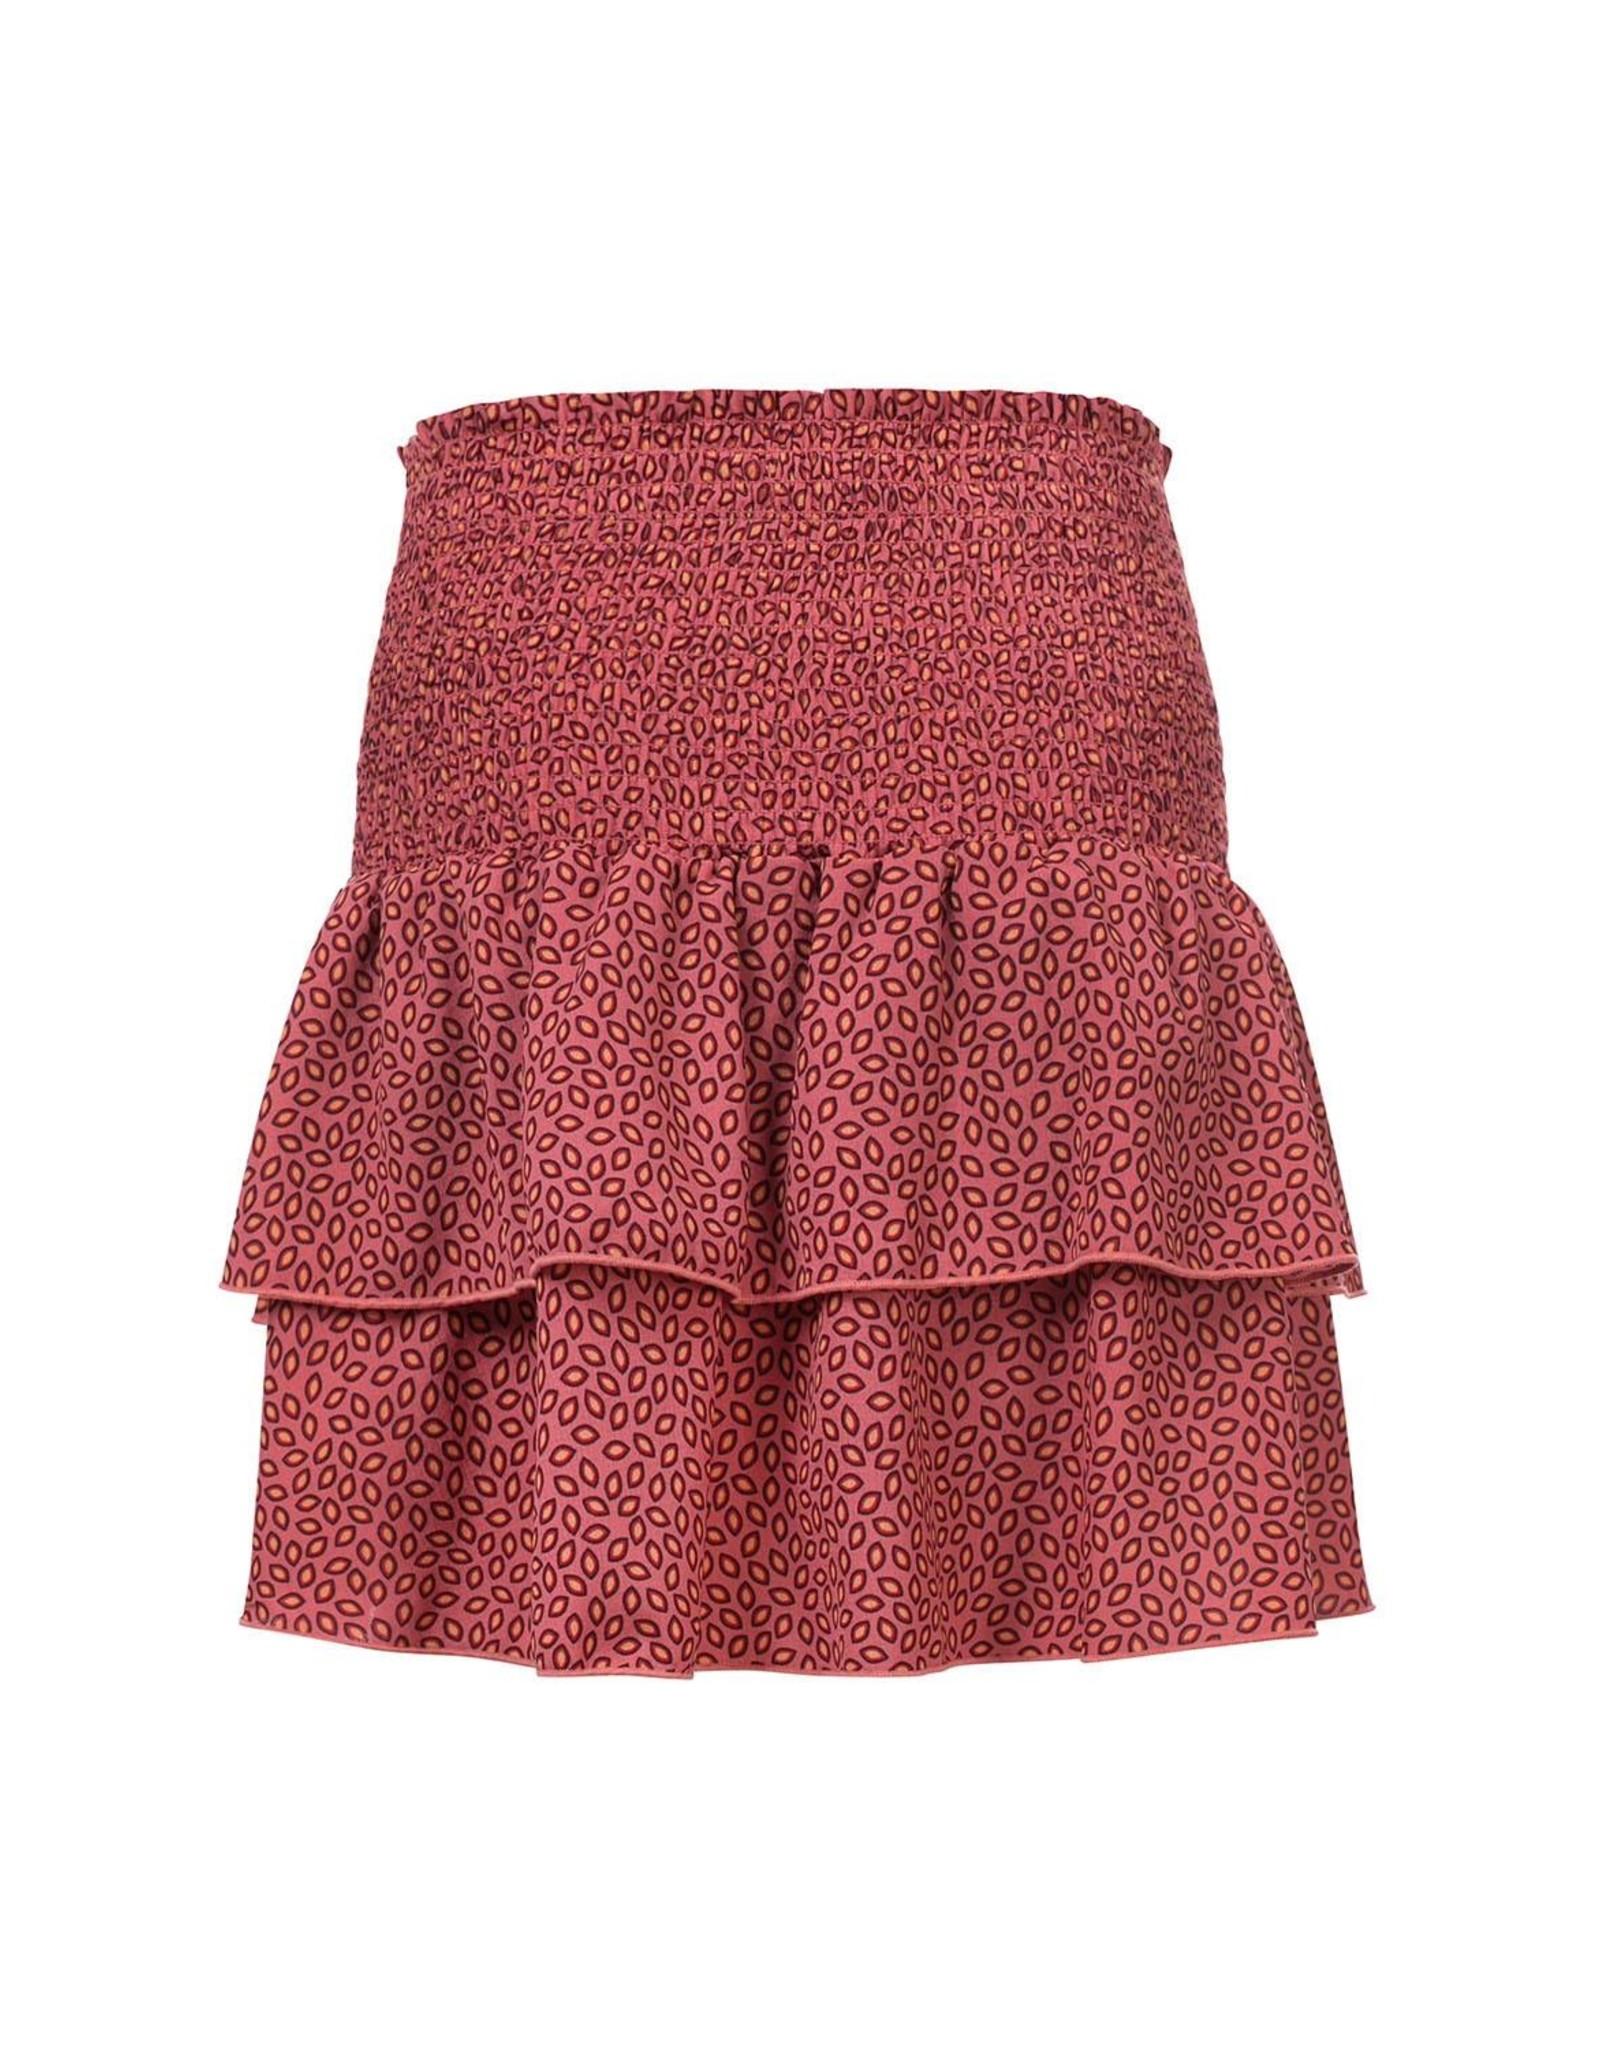 Looxs 10SIXTEEN 10Sixteen printed skirt blush